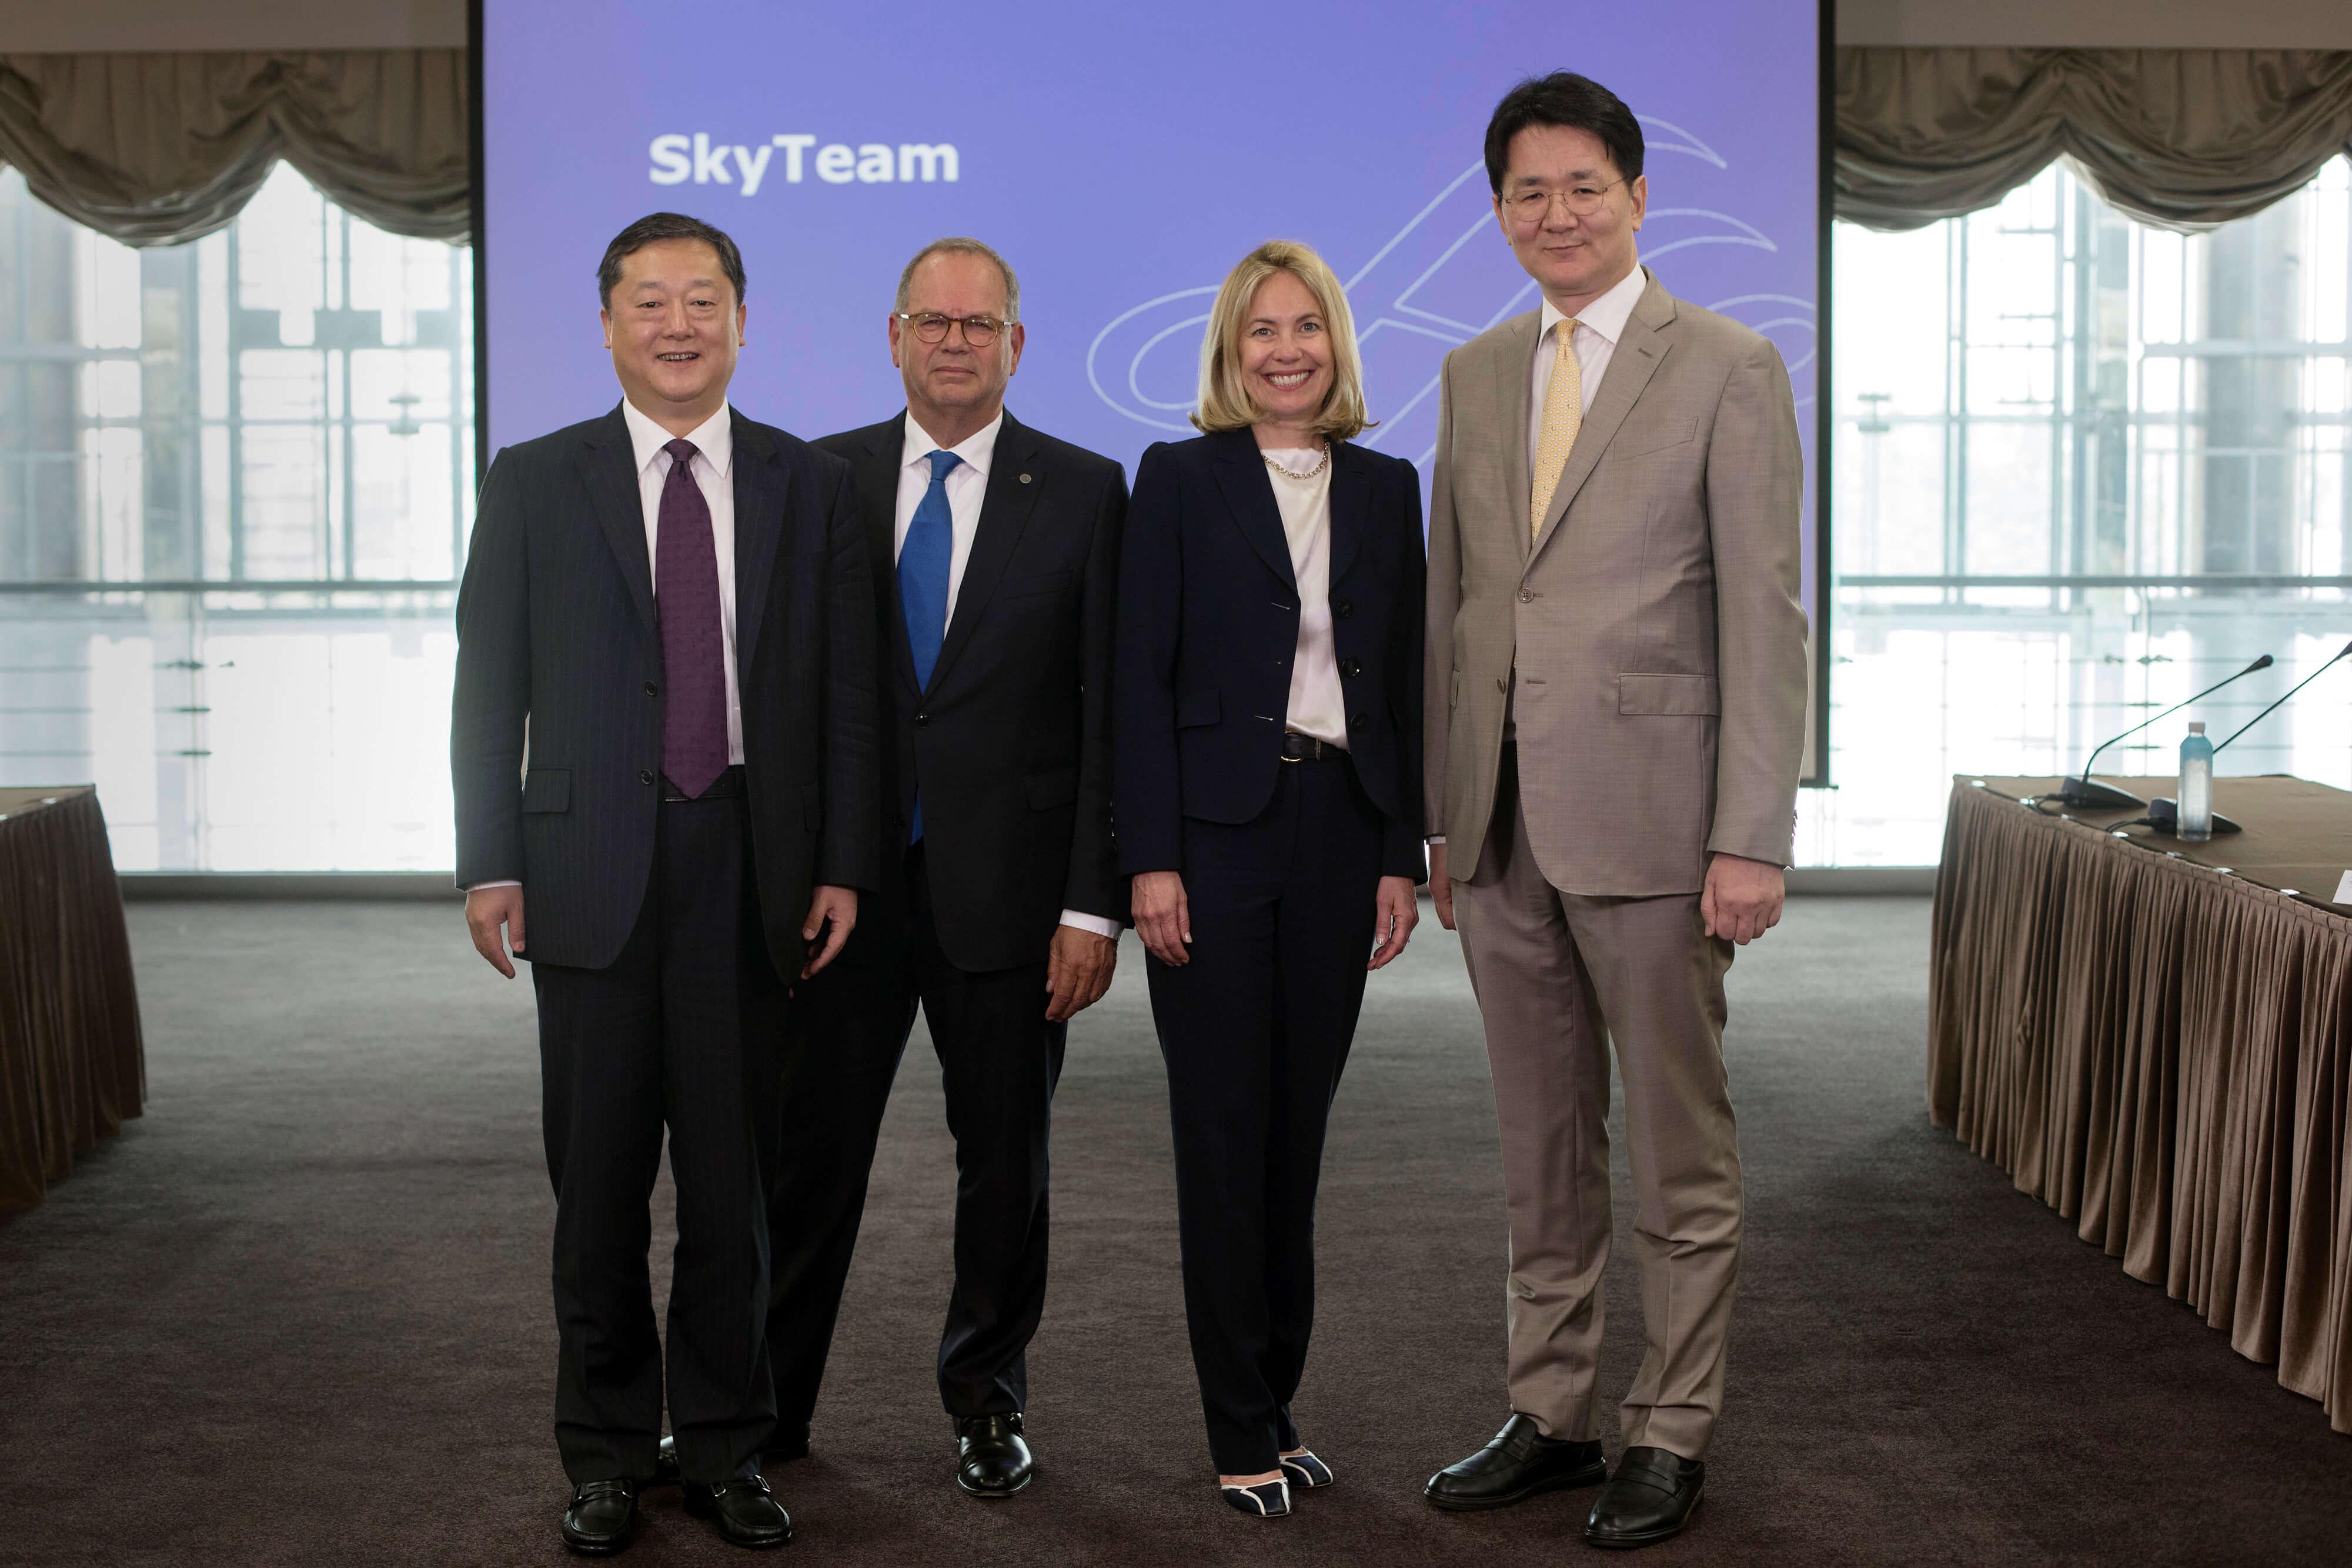 SkyTeam Announces Walter Cho, Chairman and CEO of Korean Air, as Chair of its Alliance Board